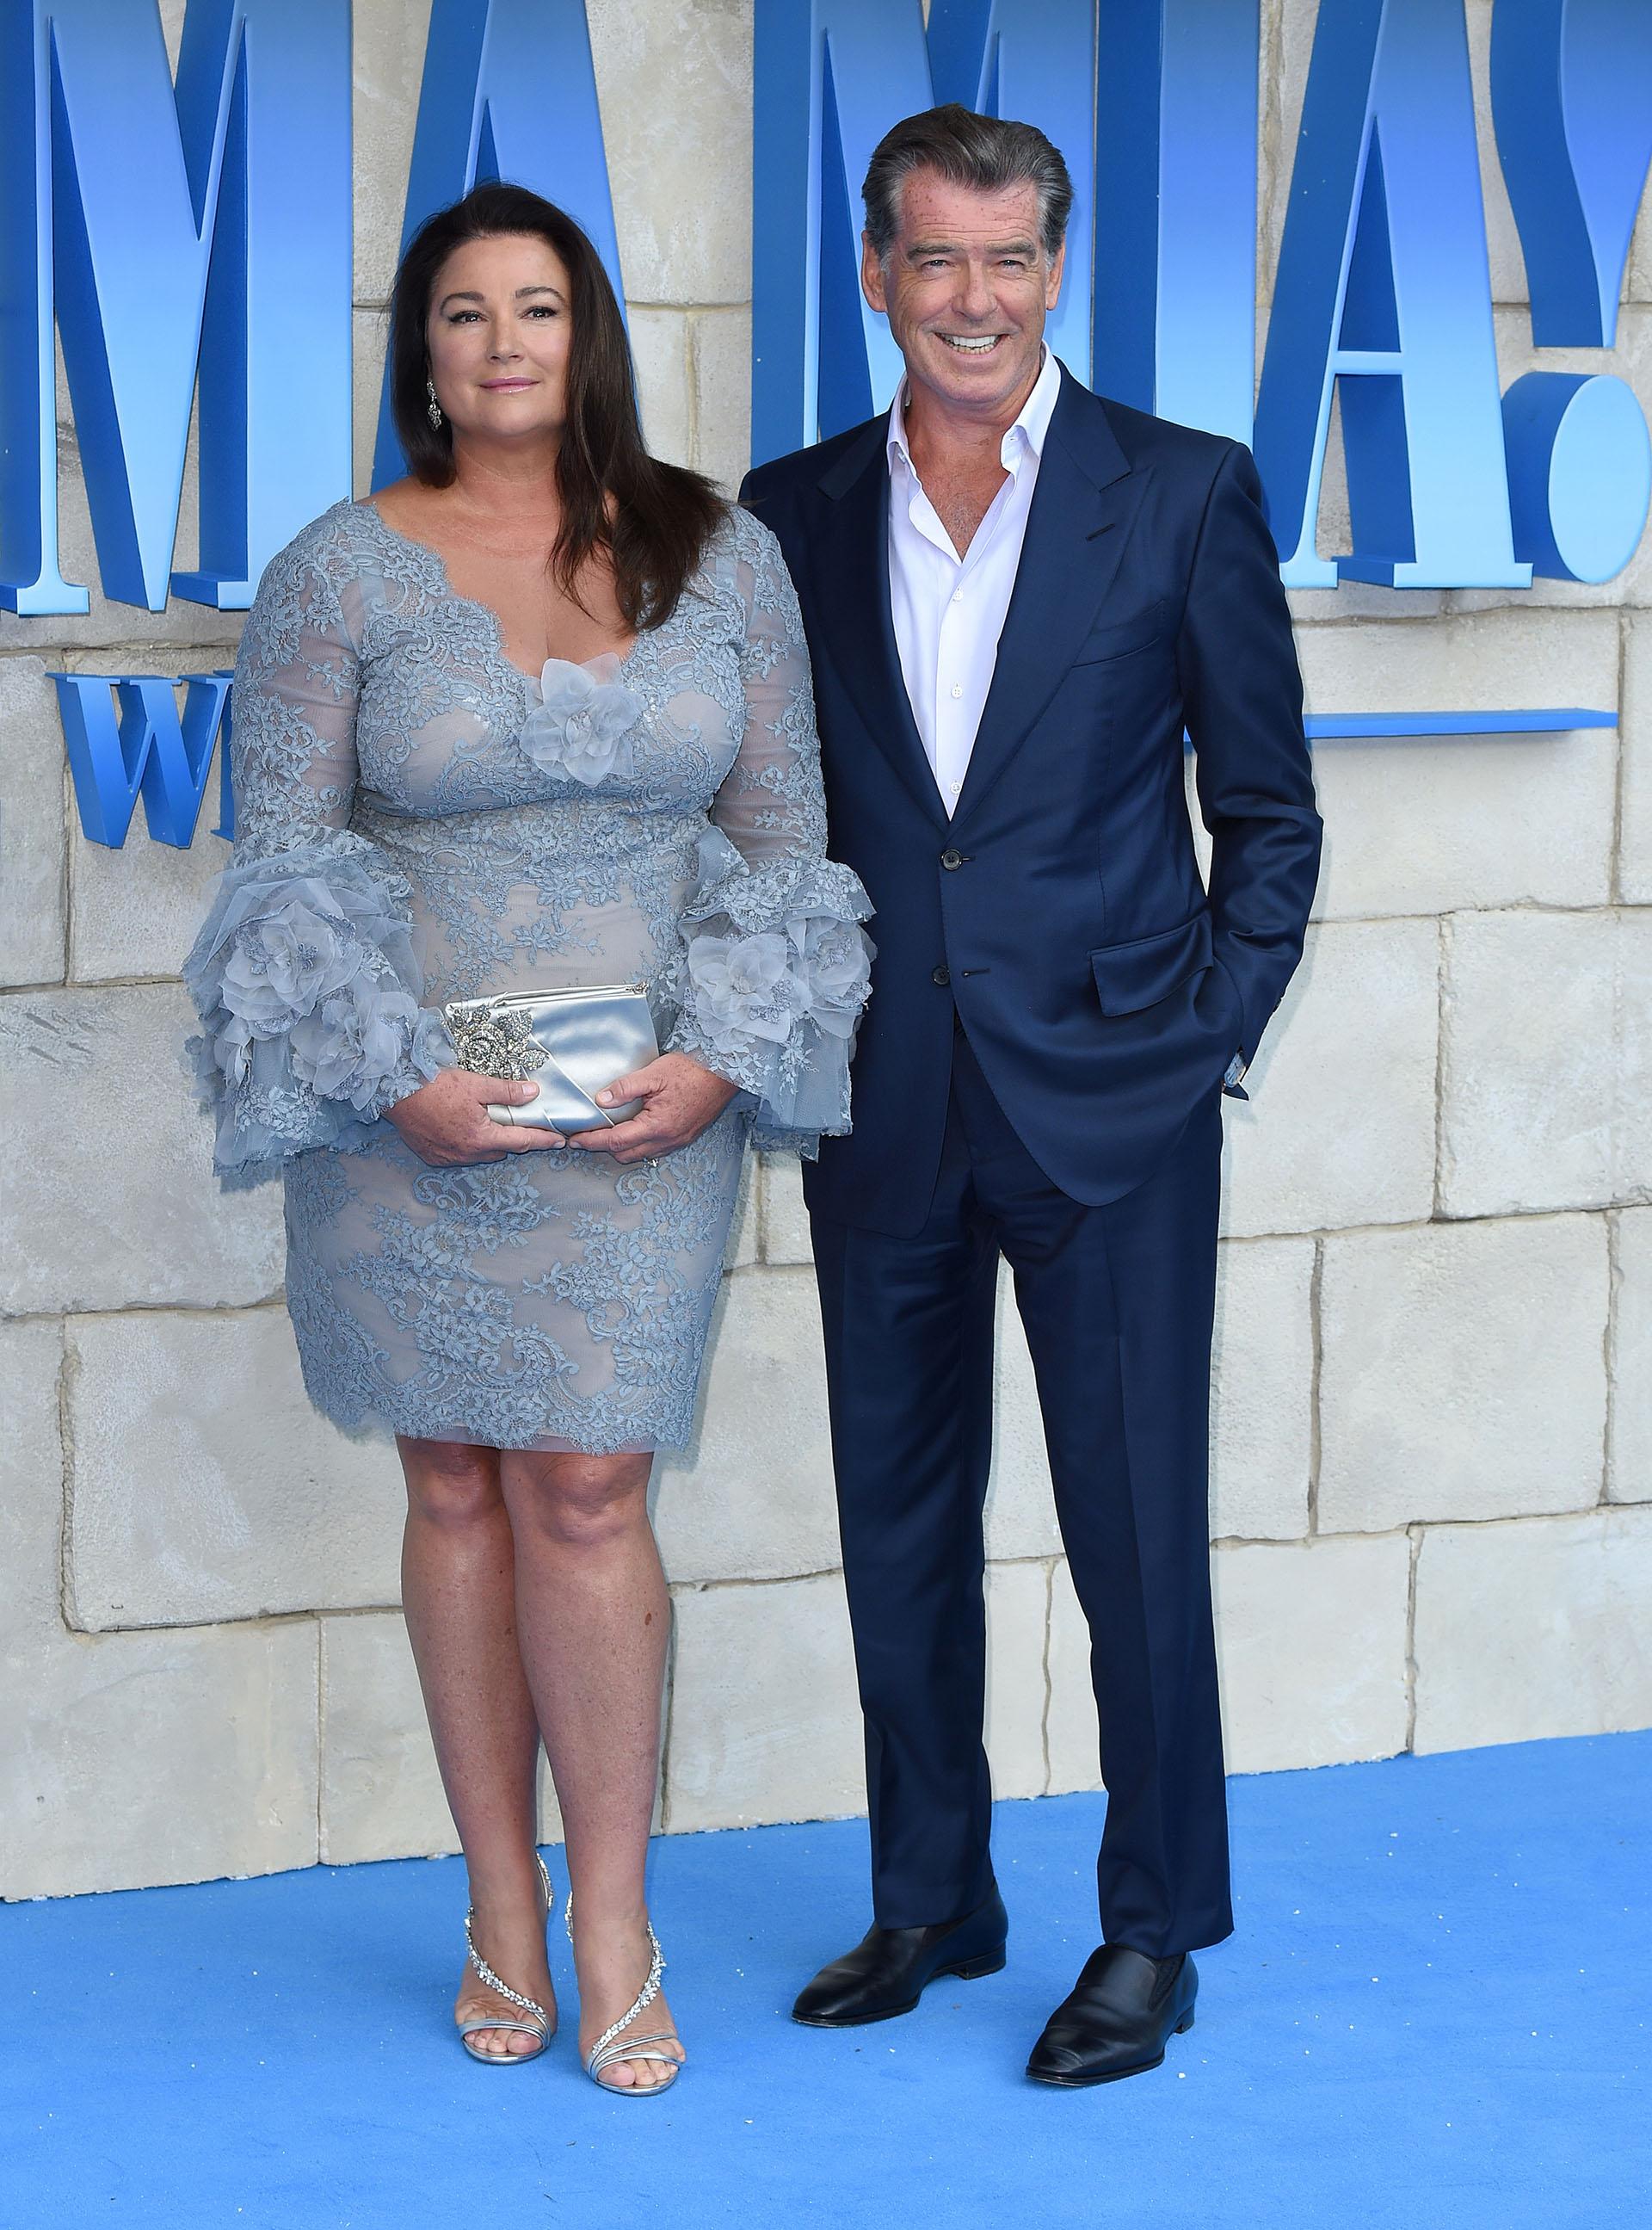 Pierce Brosnan y su mujer Keely Shaye Smith